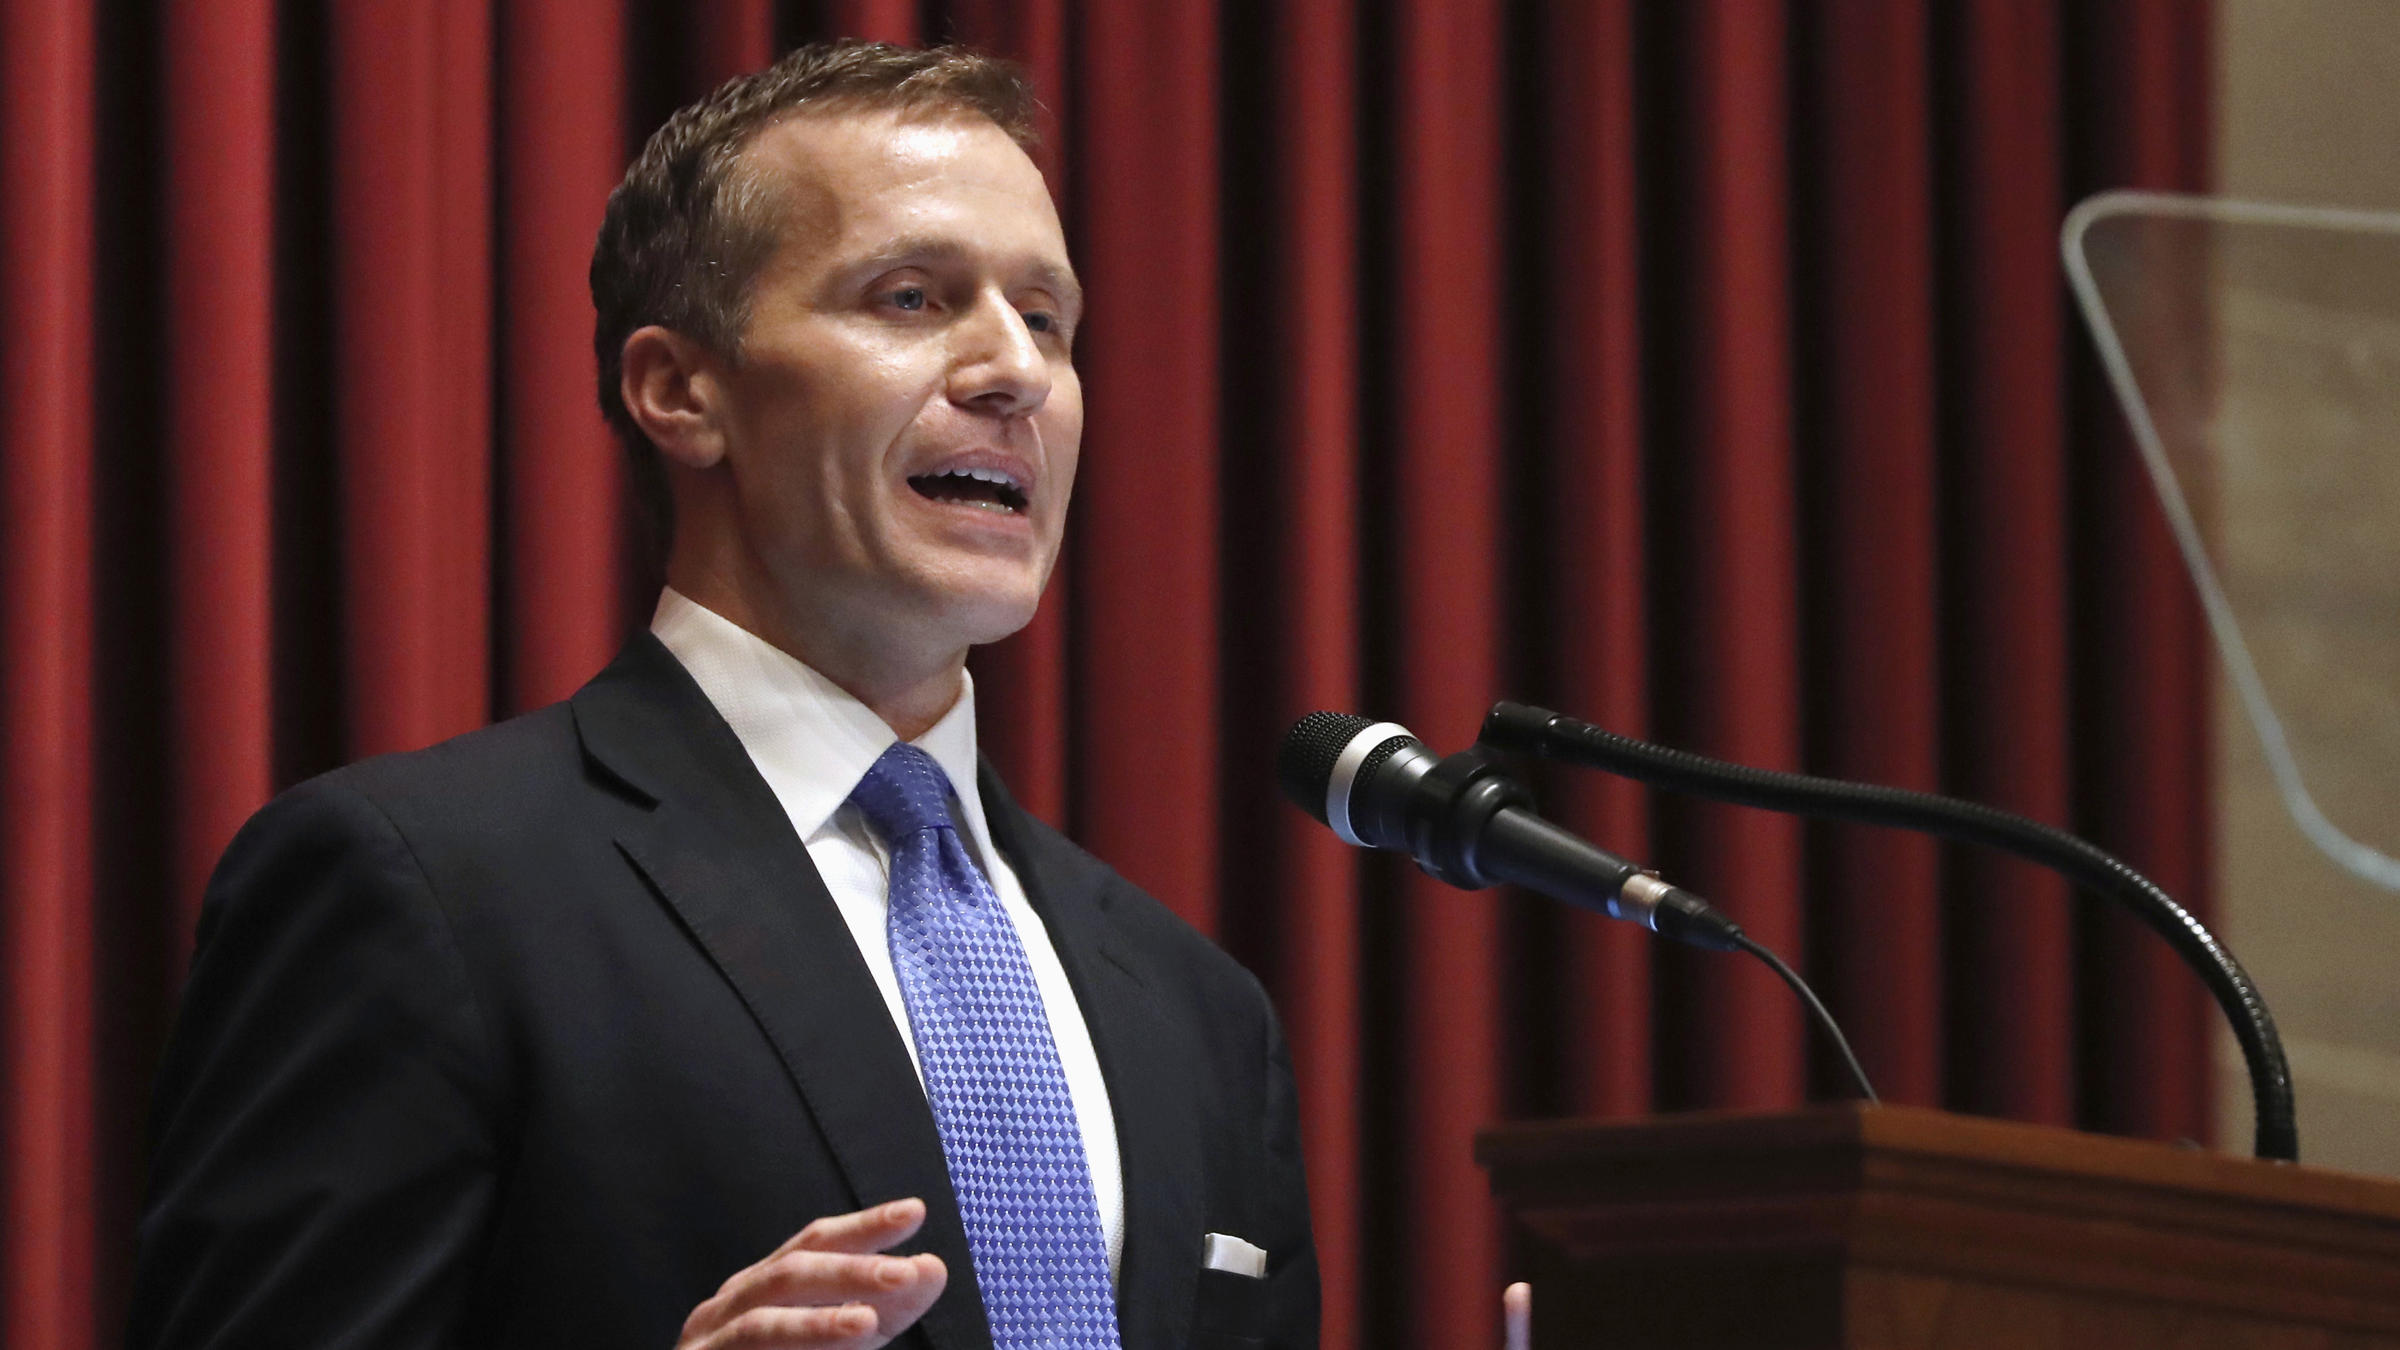 Missouri Governor Admits Affair, Denies Blackmail Allegations